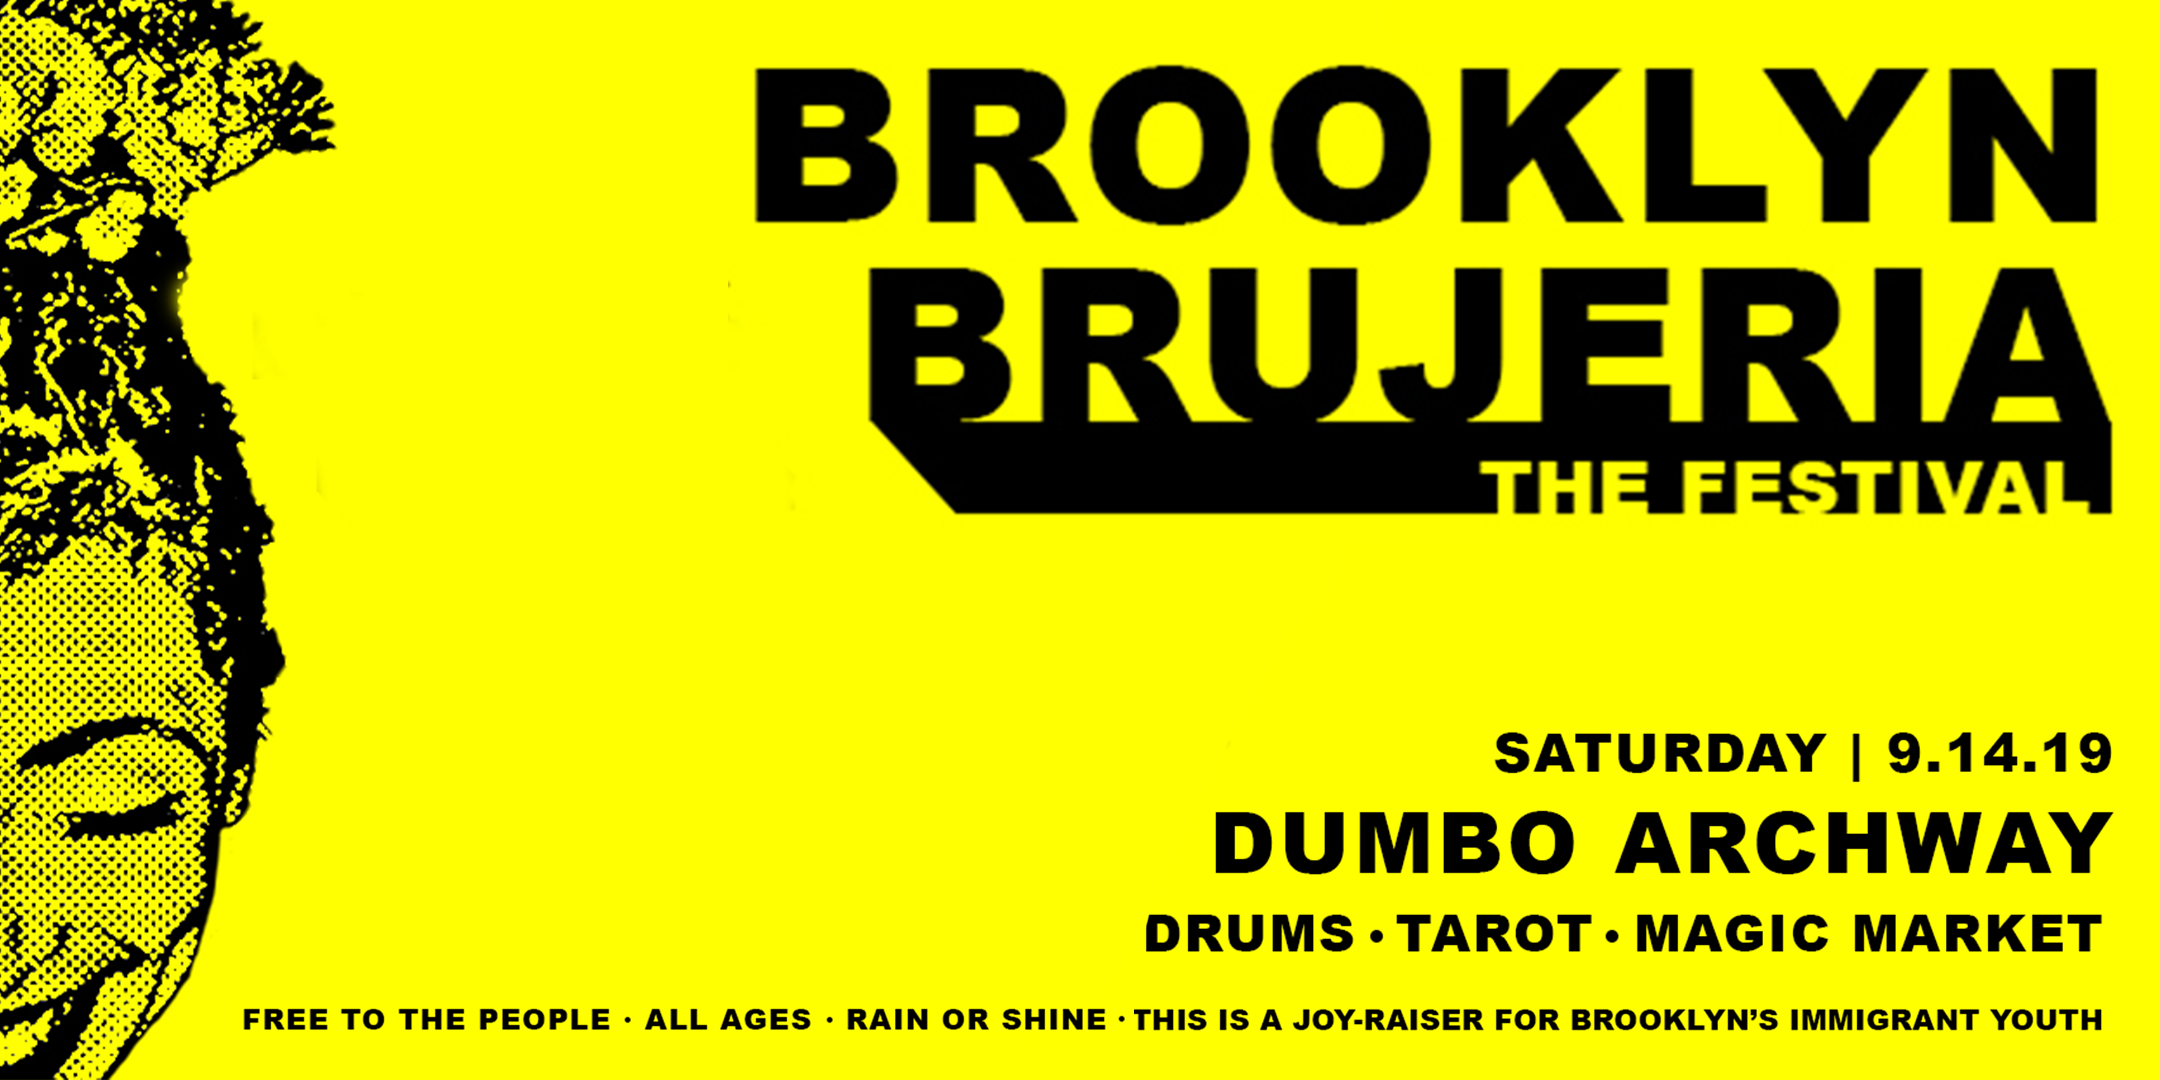 2019.07.25_BrooklynBrujeria Festival_eventbrite banner festival.png